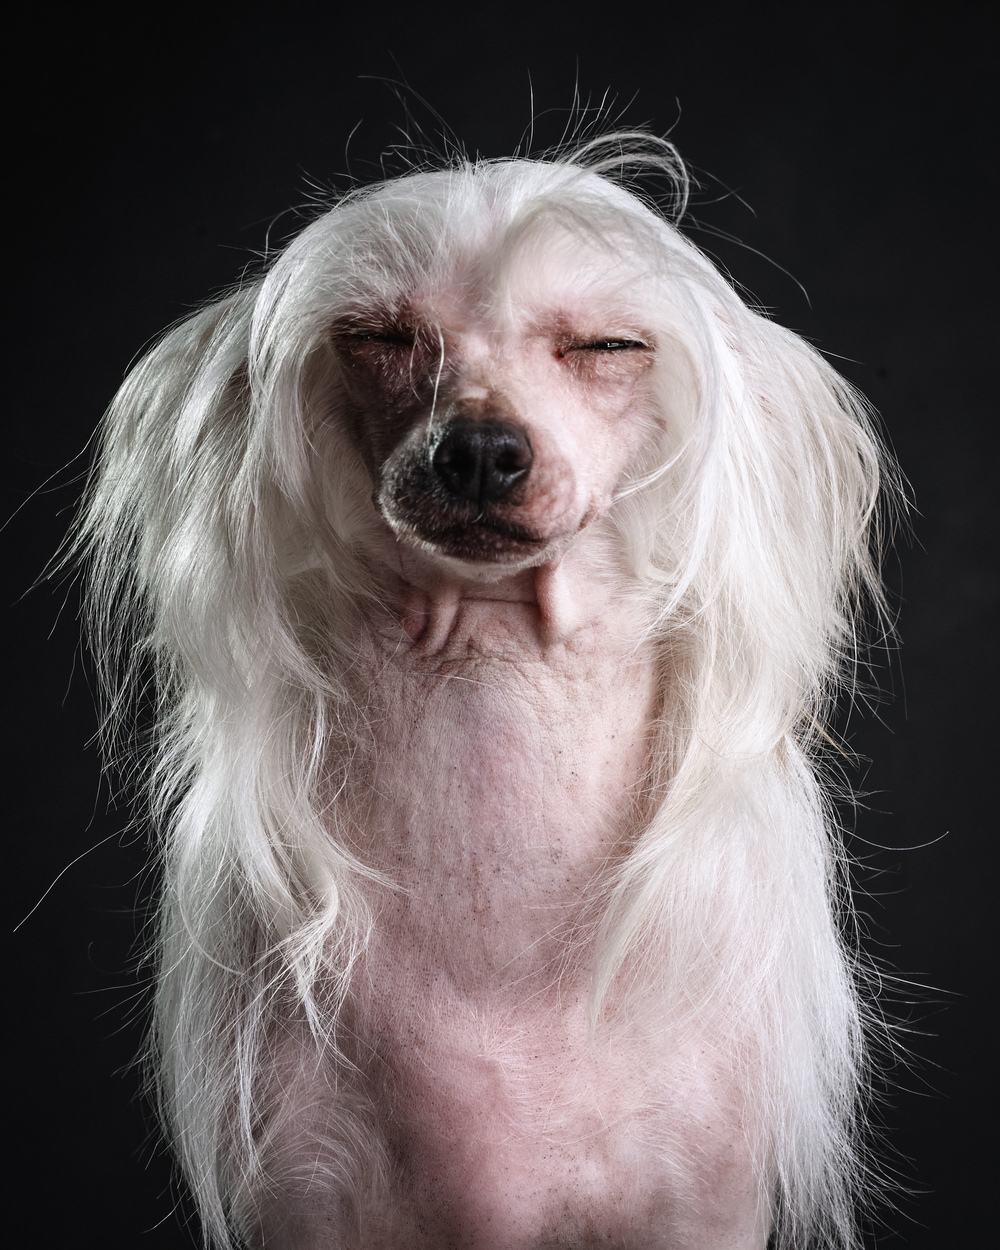 naked-dogs-klausdyba-25.jpg